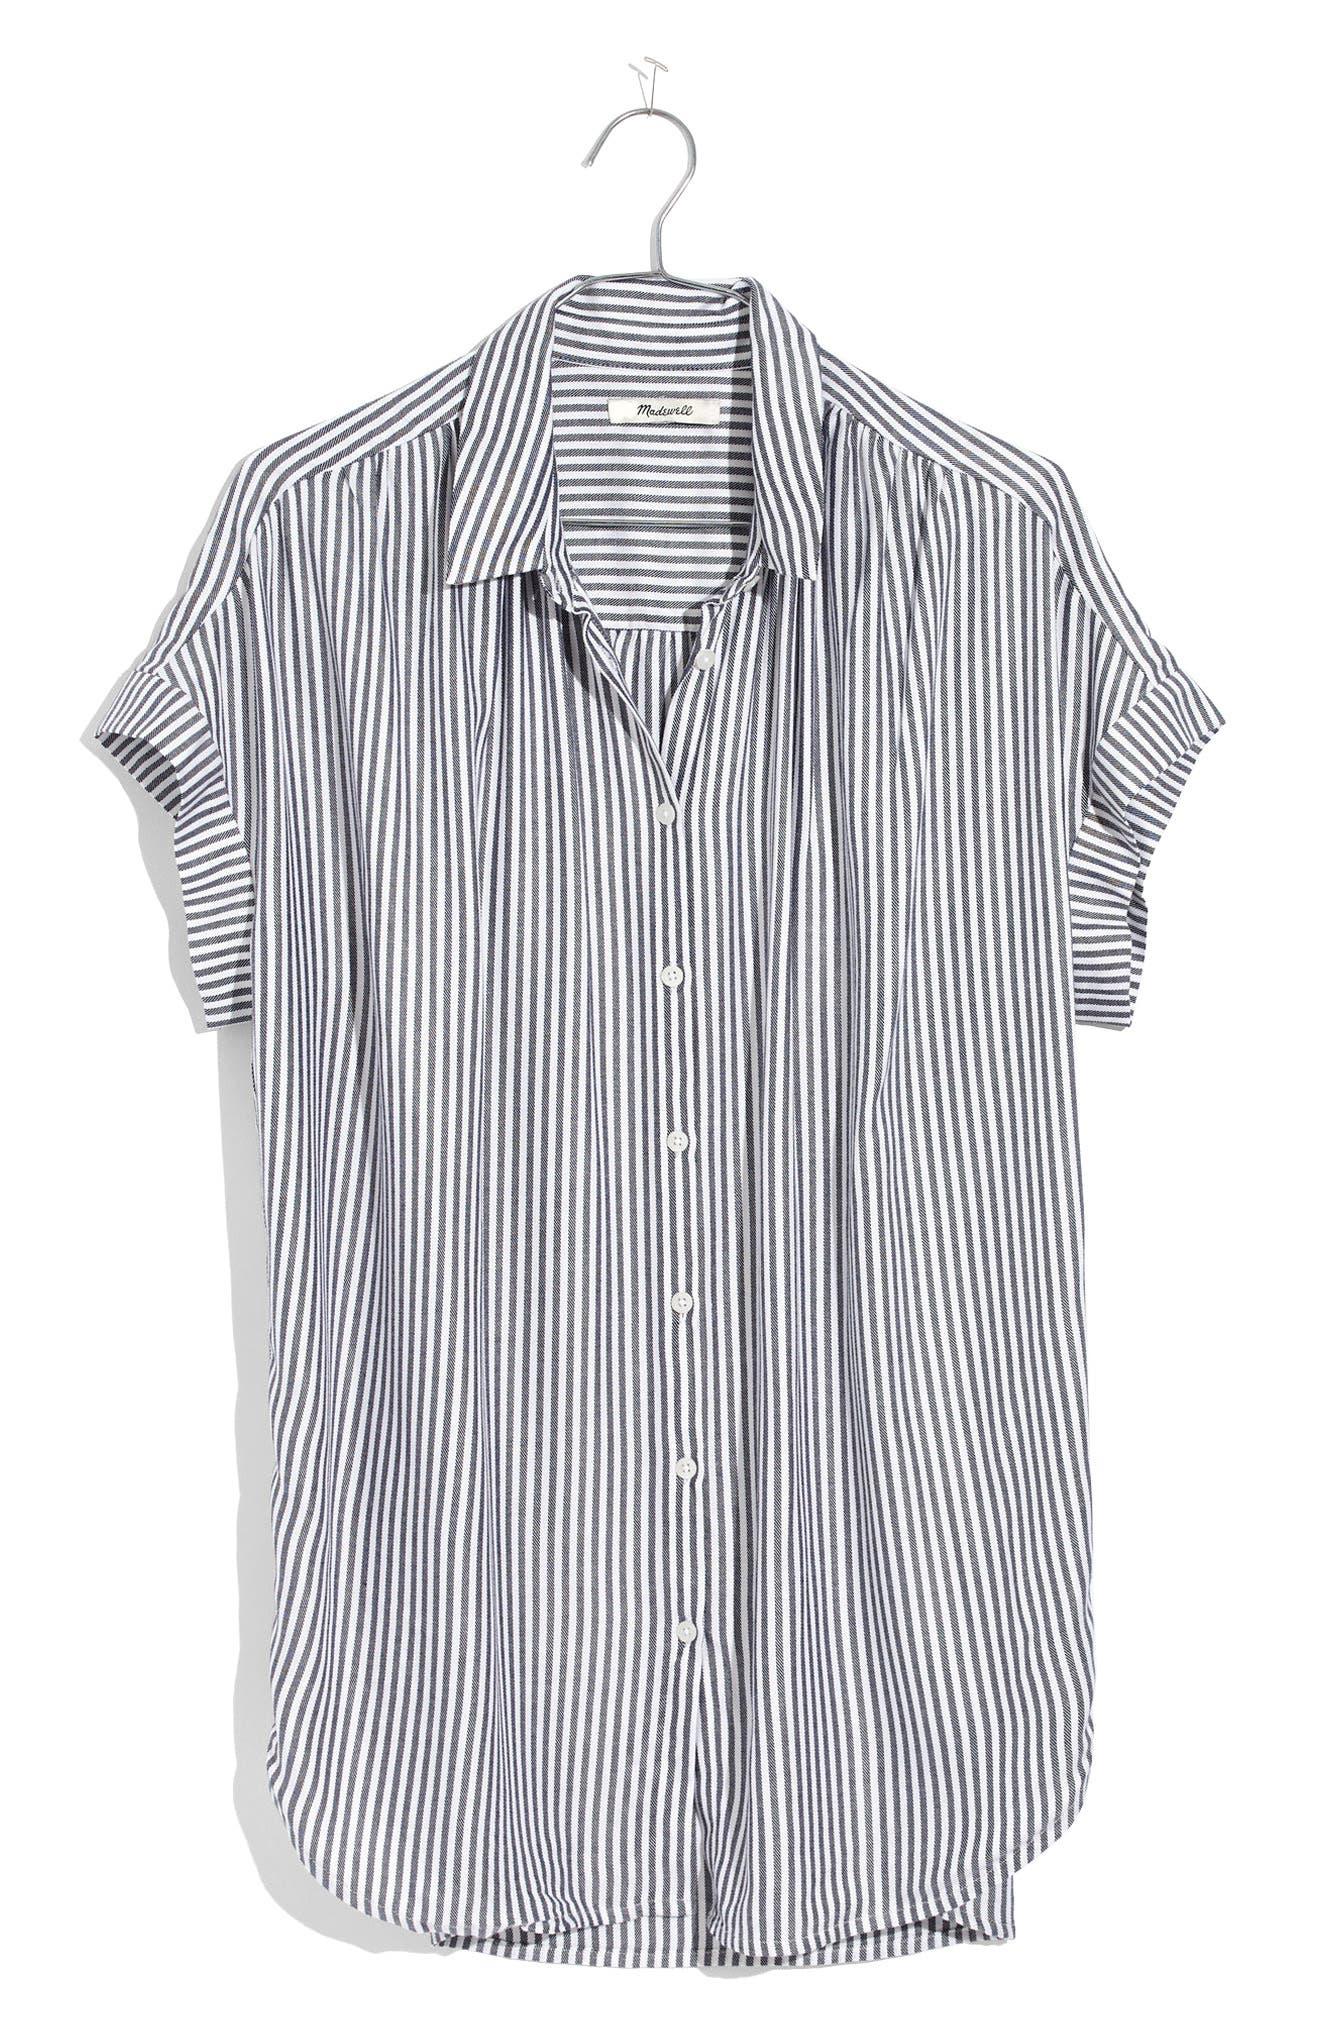 Central Stripe Shirt,                             Main thumbnail 1, color,                             Navy/ Ivory Stripe